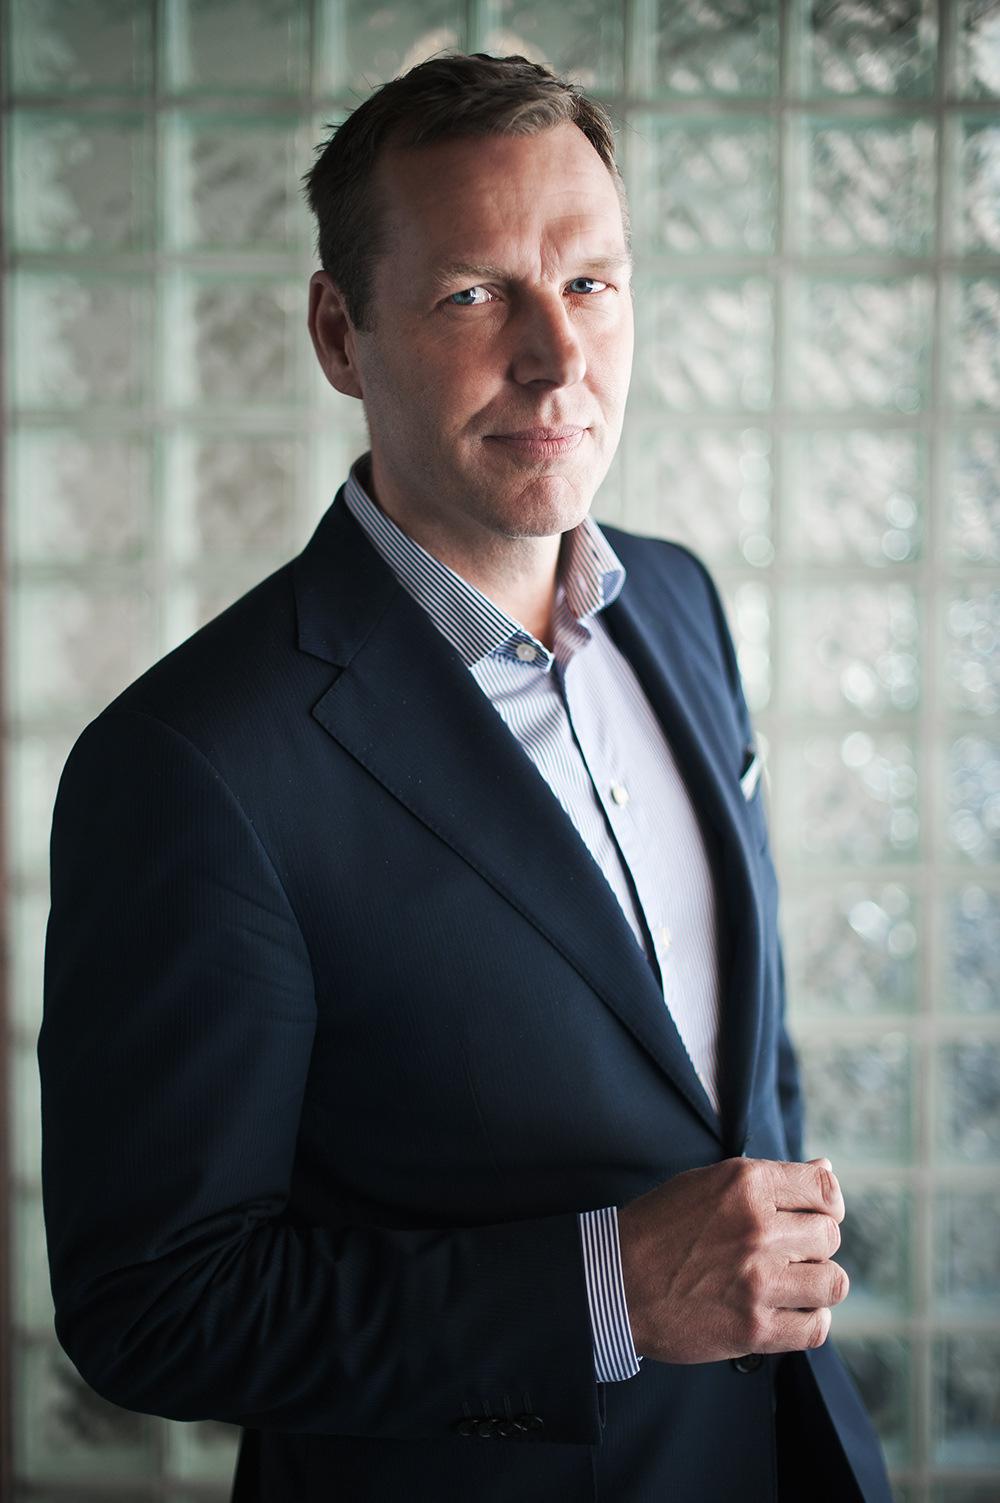 Mareike Timm | Photo Journalist - Johan Dennelind, CEO Telia Sonera. For Fokus, 2014.